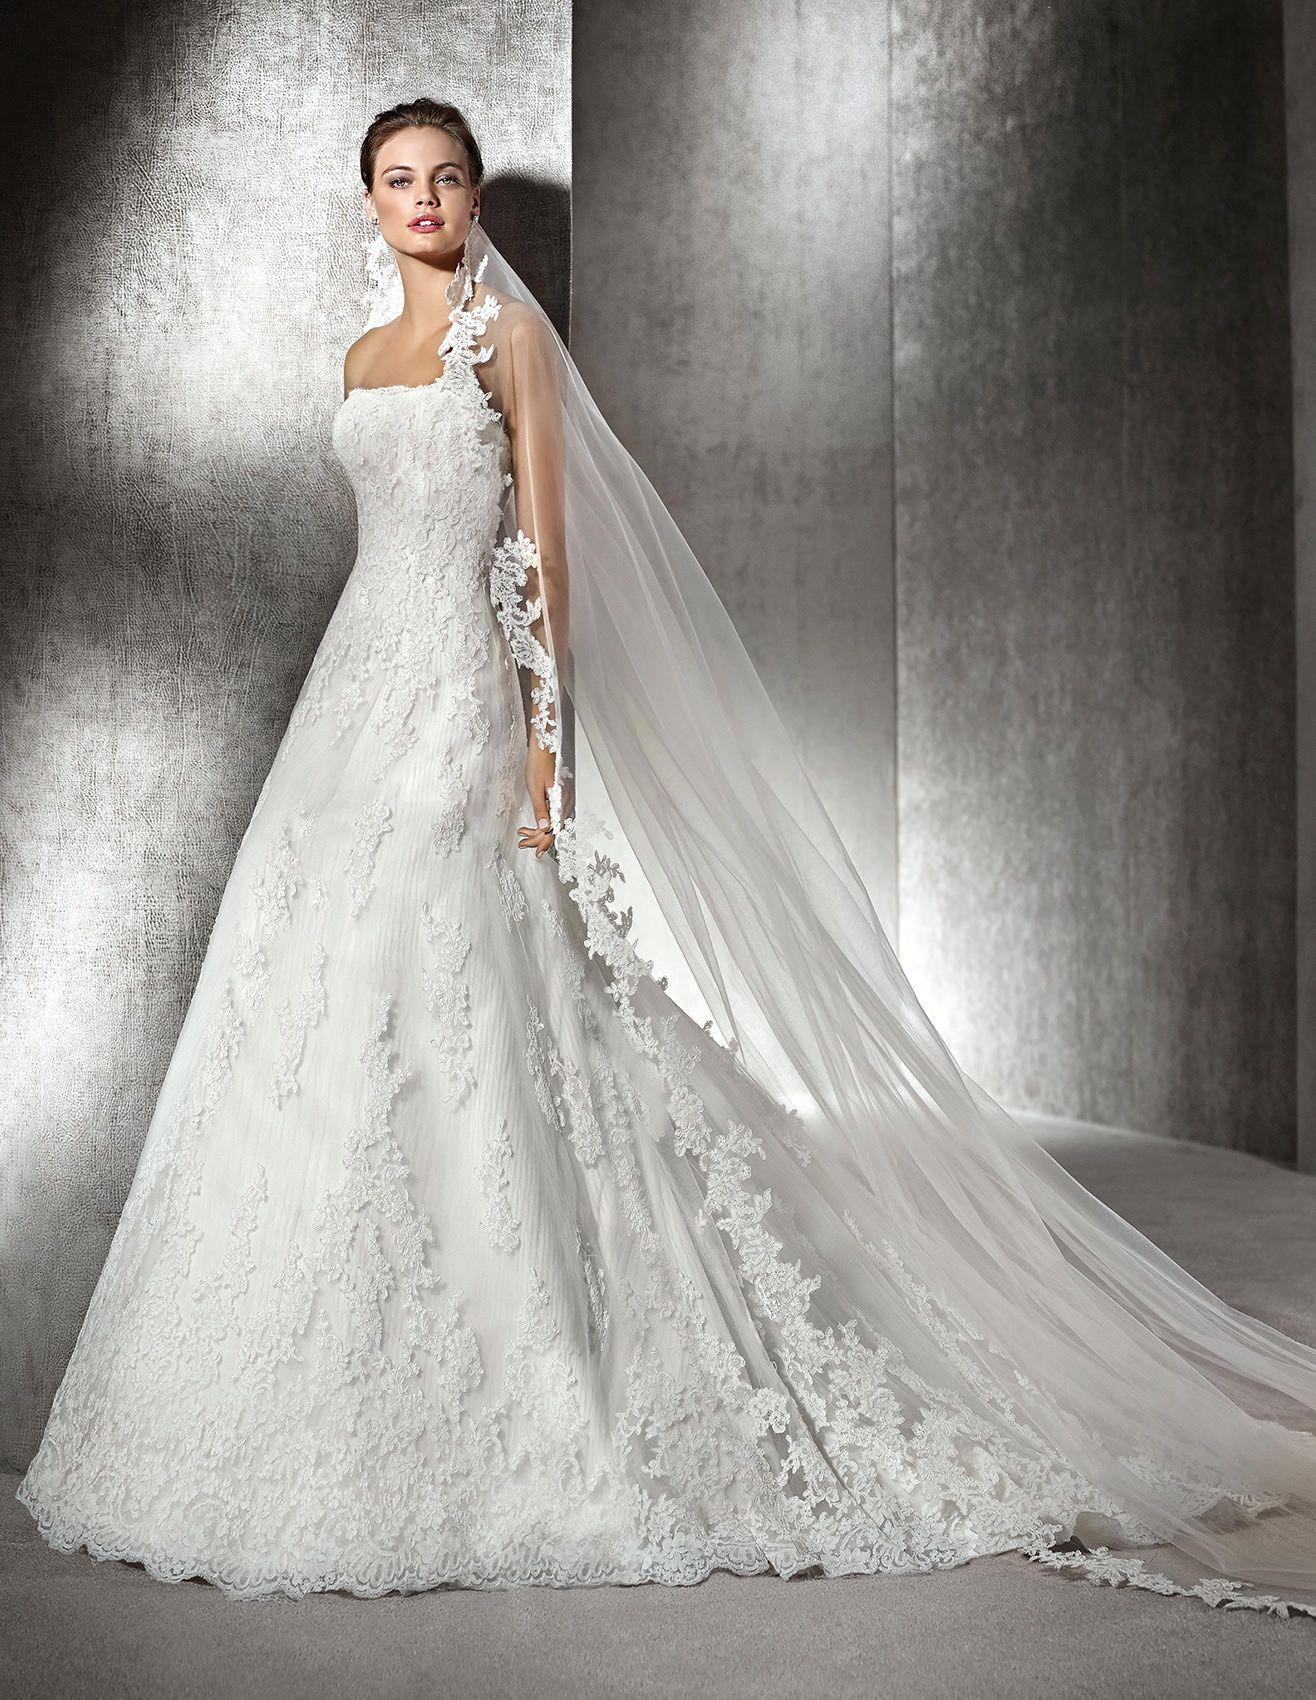 Popular AMERICA Mermaid wedding dress with sweetheart neckline St Patrick